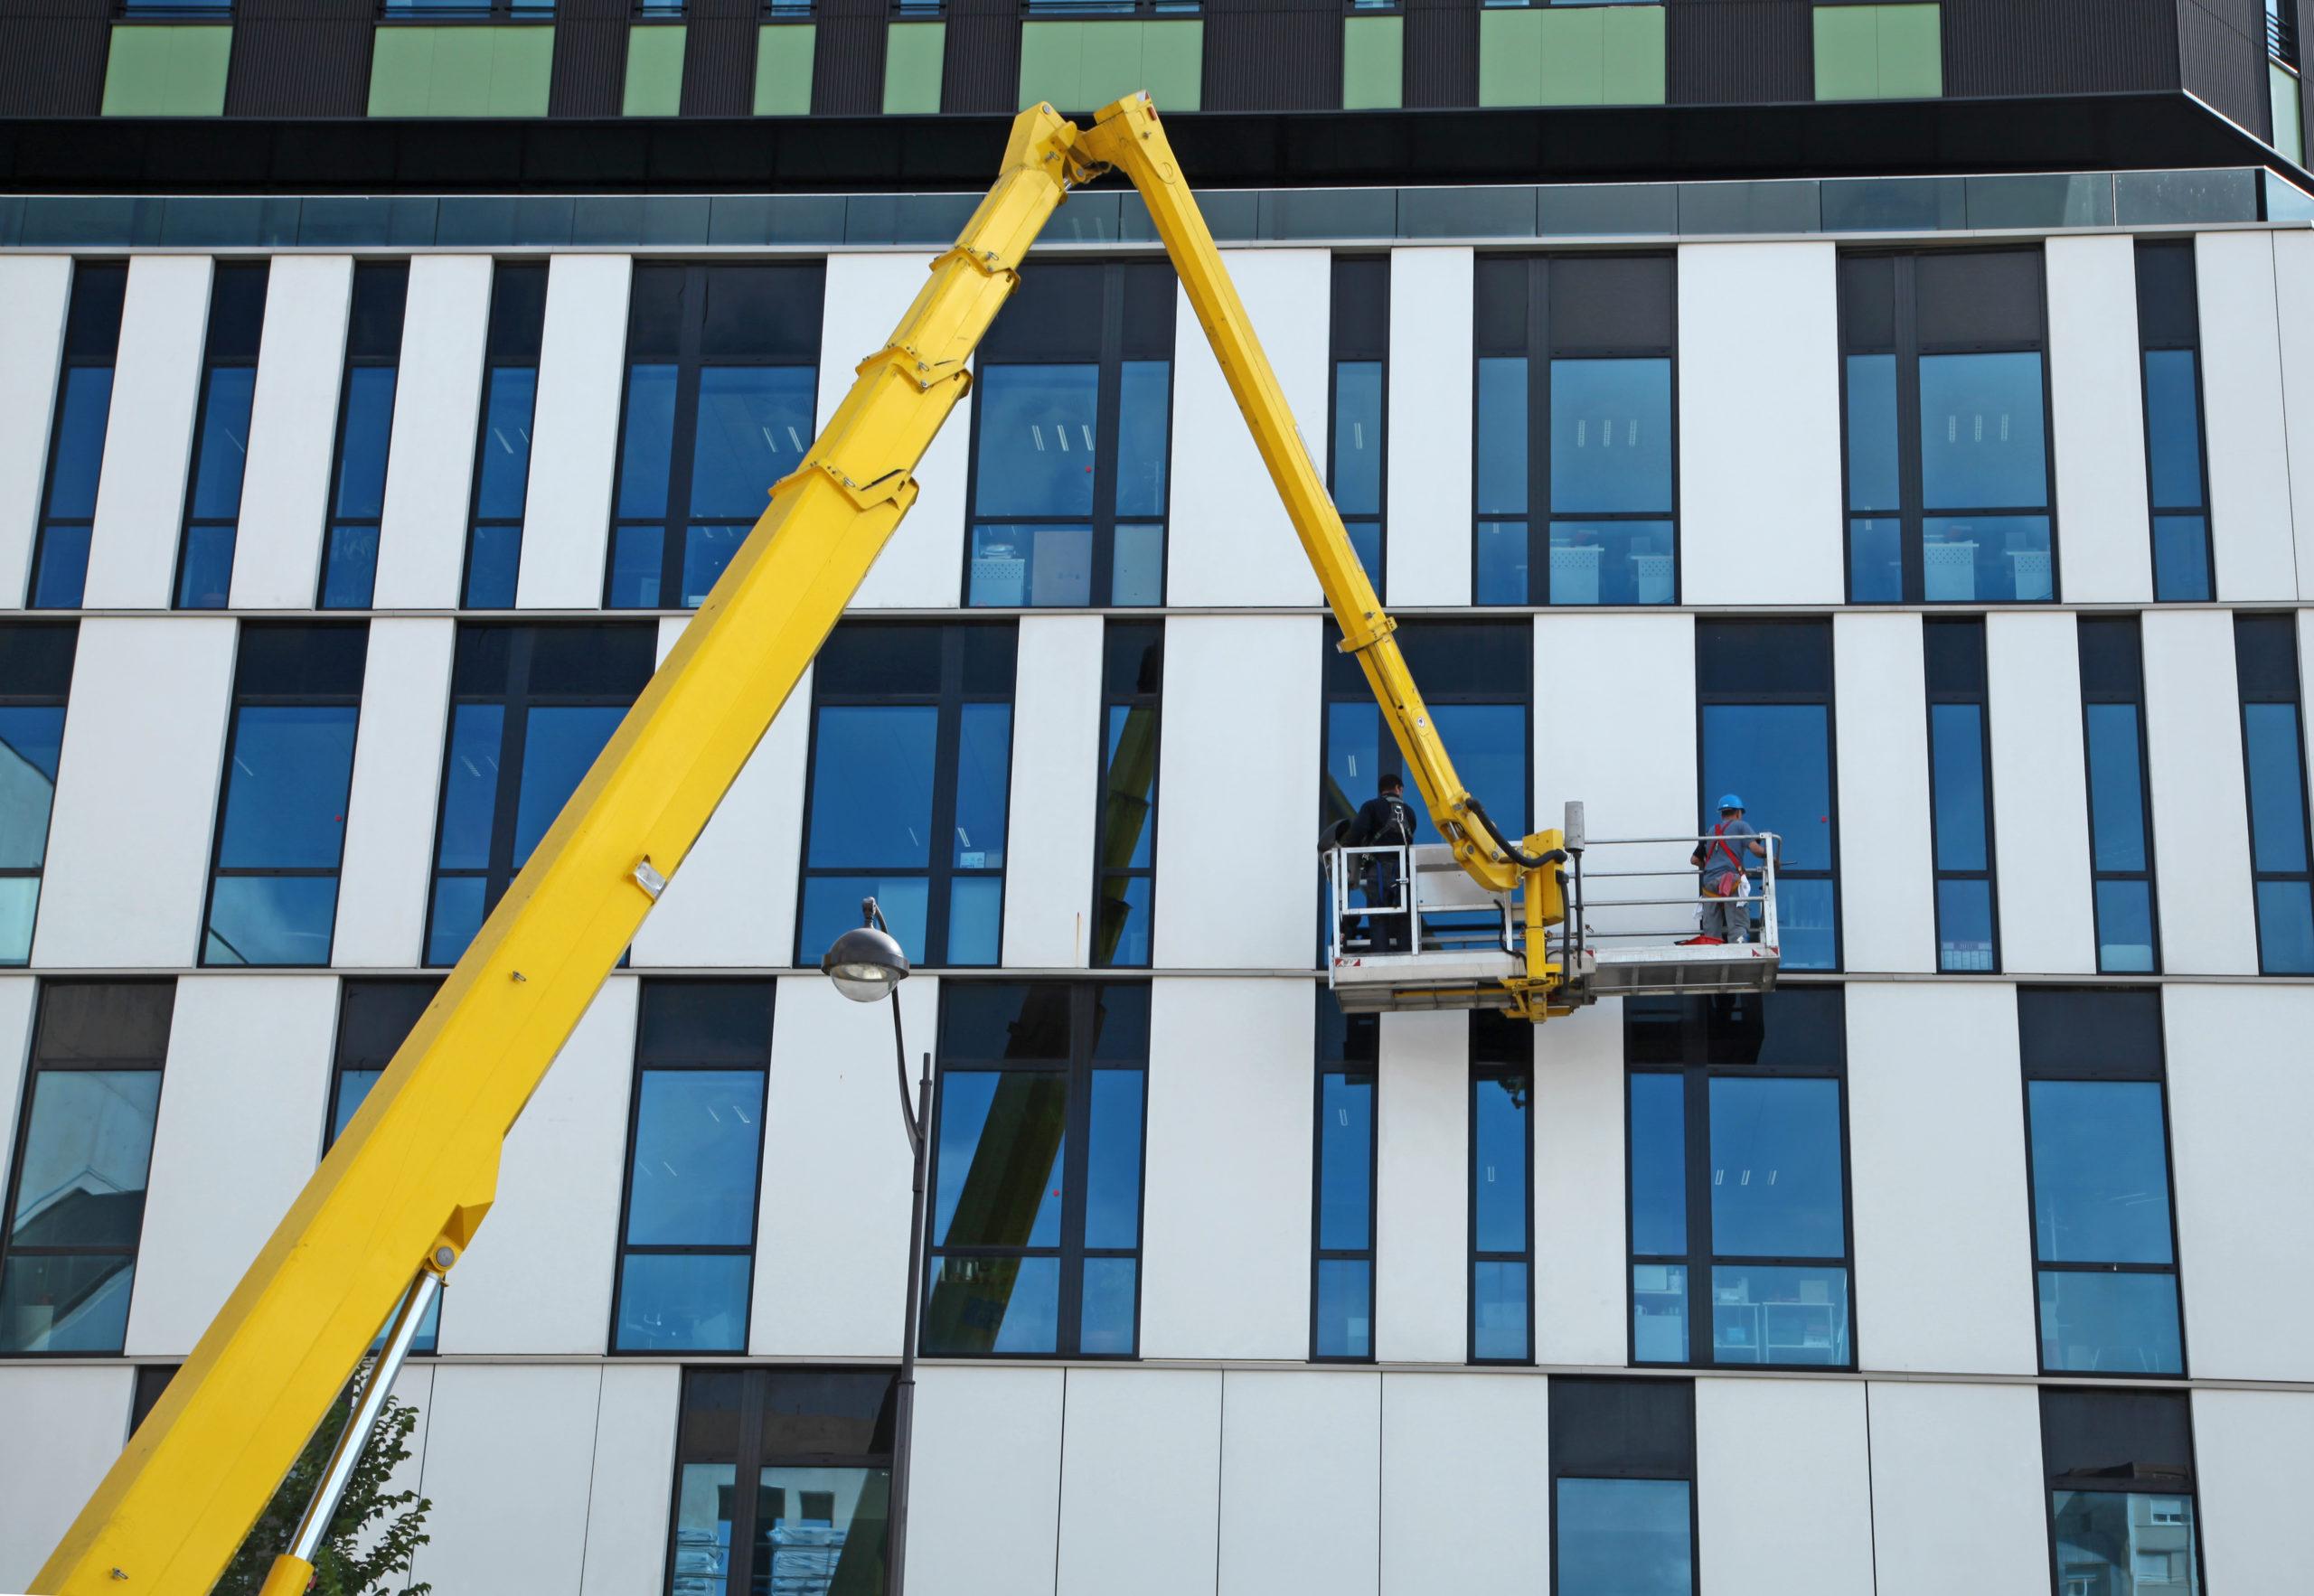 Nettoyage de vitres Liège